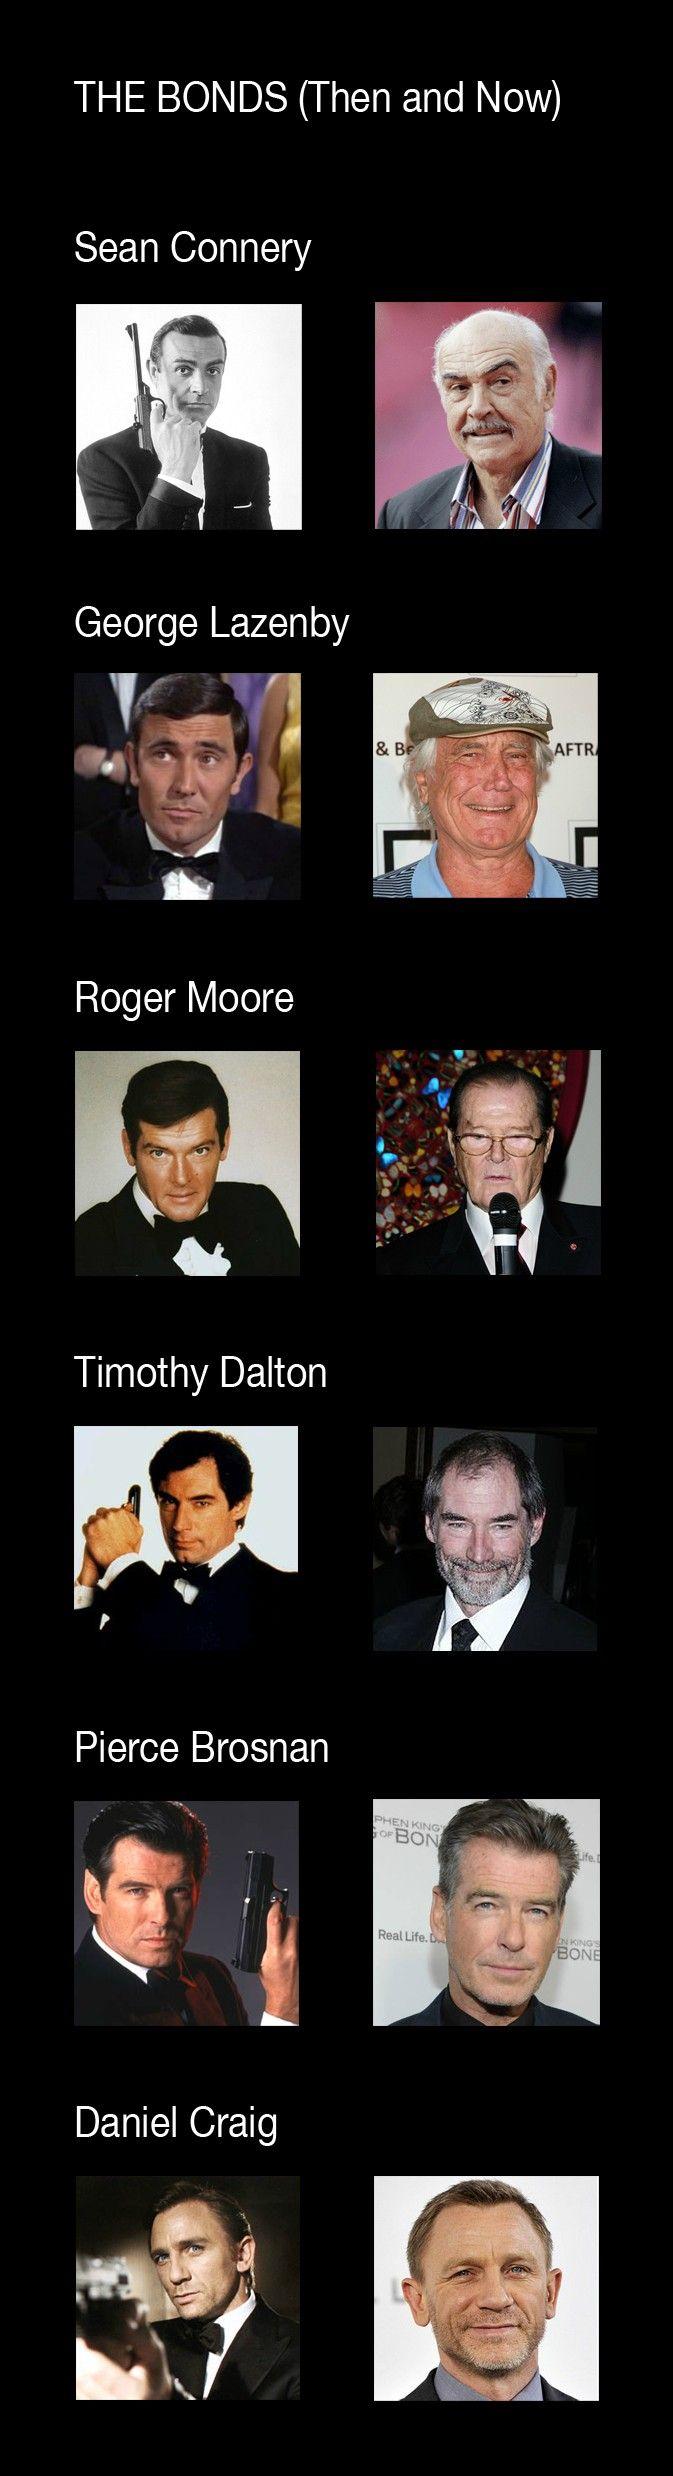 Sean Connery & Daniel Craig, Best Bond hands down .... George Lazenby ... Roger Moore ...Timothy Dalton... Pierce Brosnan ... & Daniel Craig ...